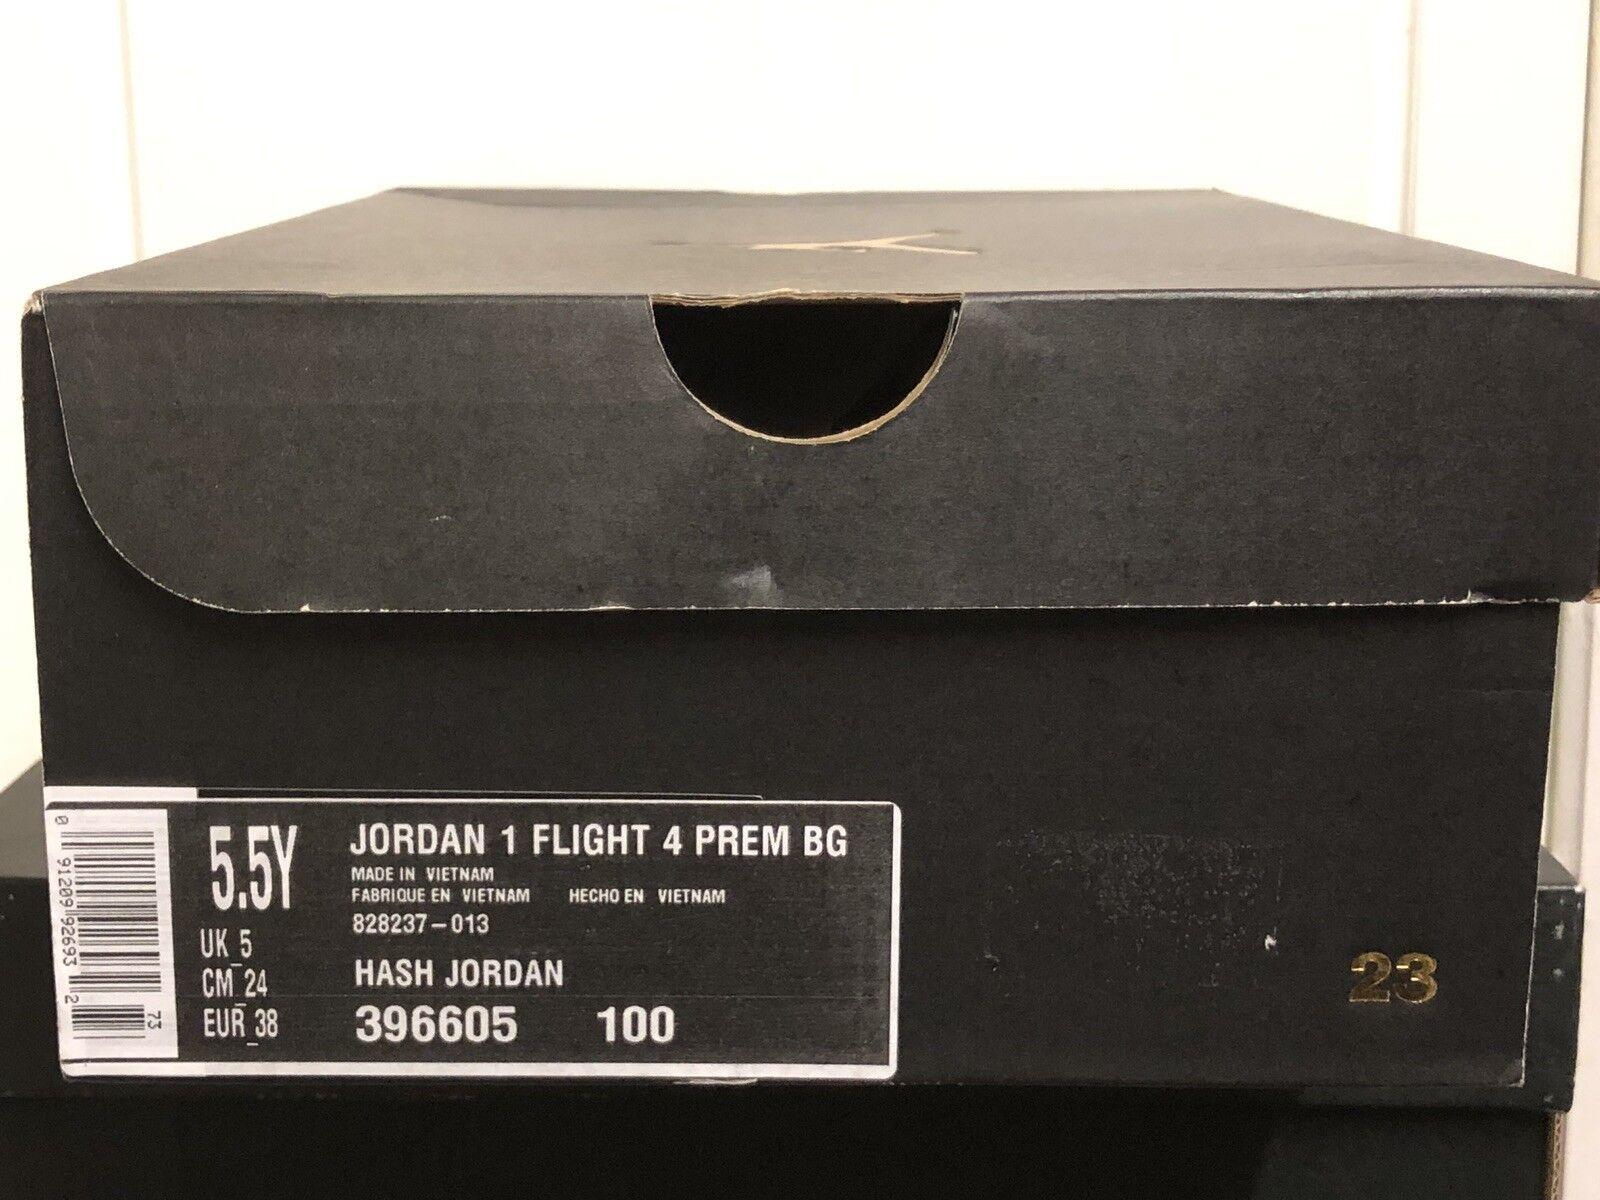 Nike AIR JORDAN 1 FLIGHT FLIGHT FLIGHT 4 PRM TRAINERS Turnschuhe schuhe UK 5 EUR 38 US 5,5Y 3822d1